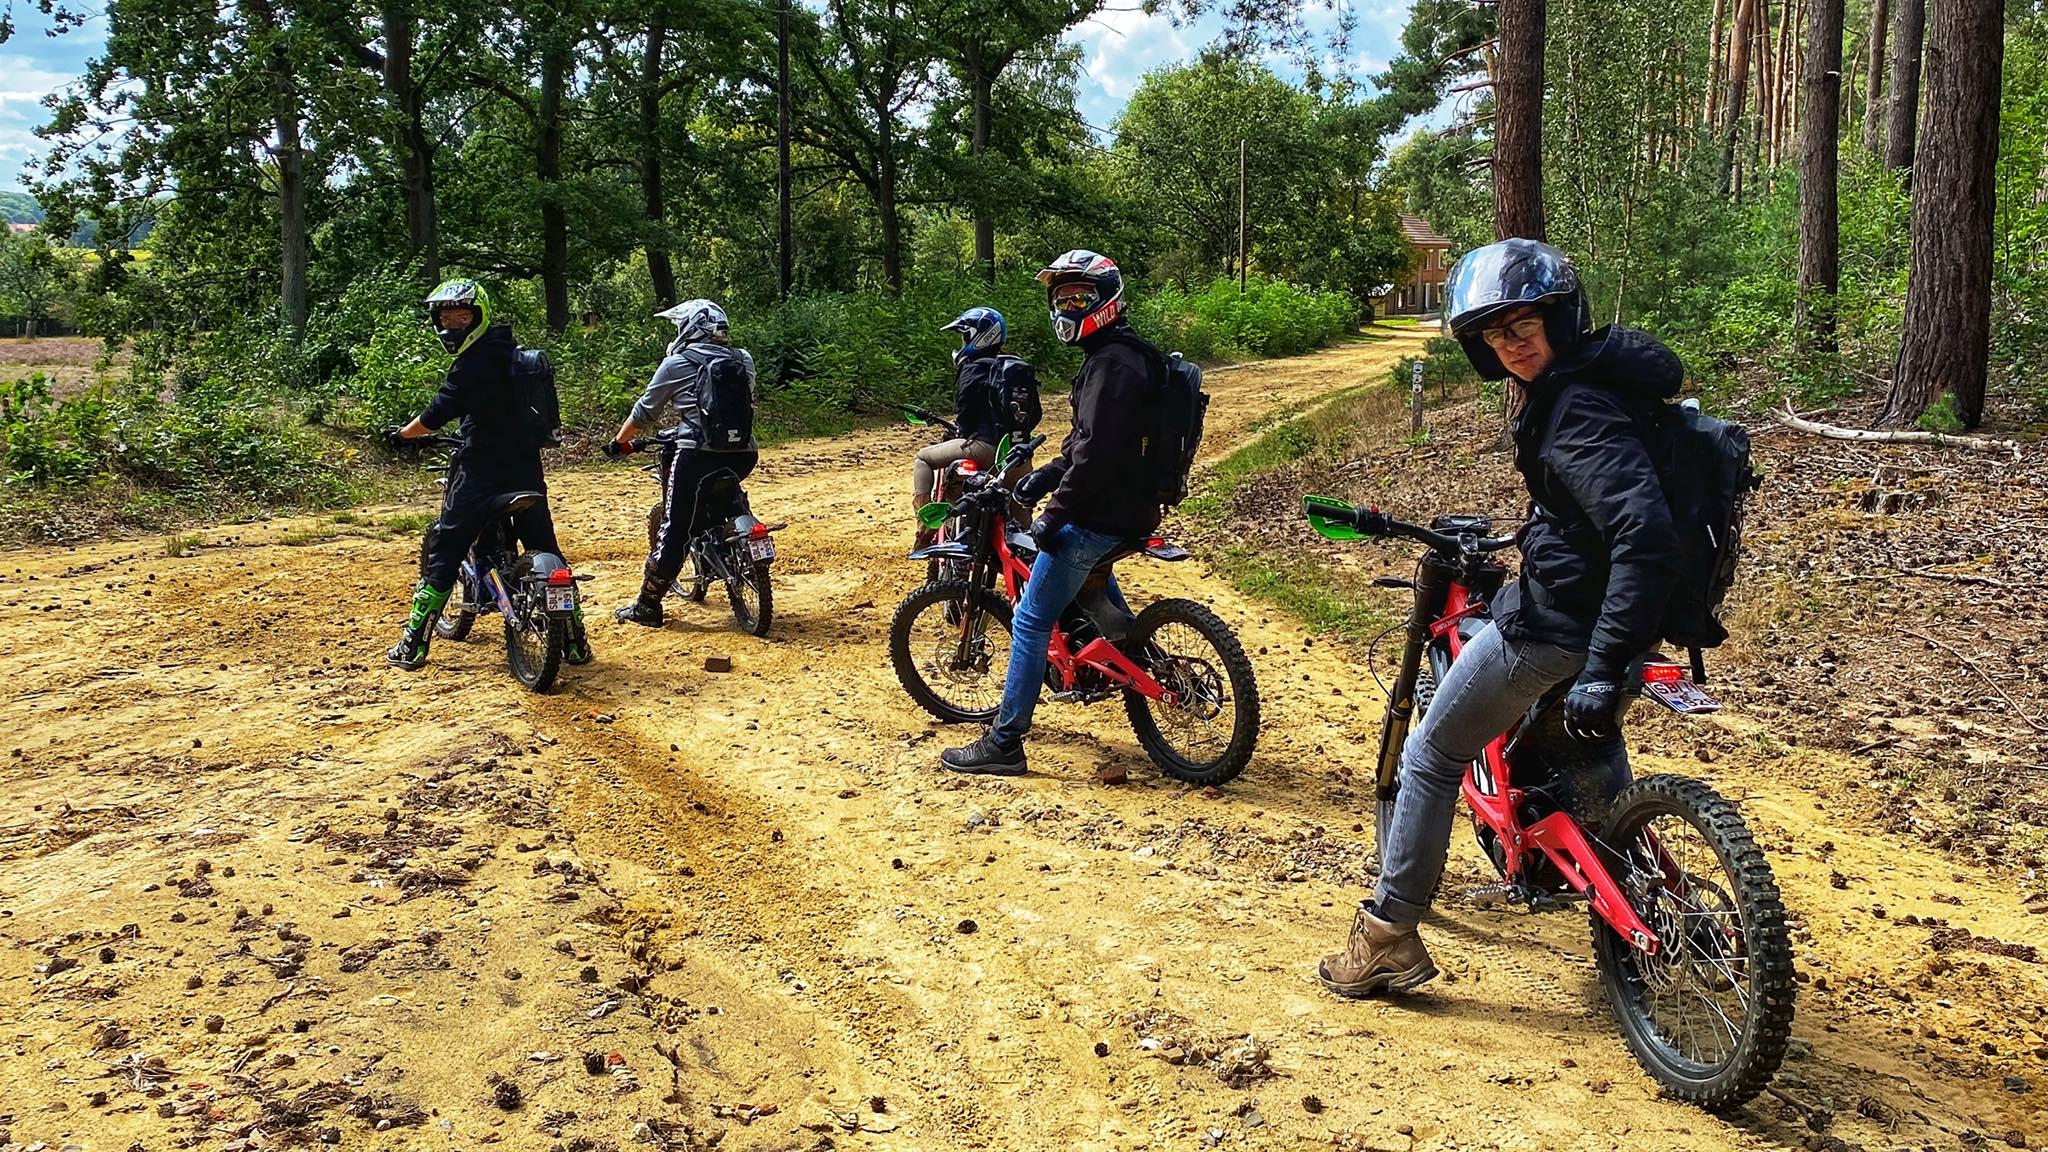 elektirsch offroad rijden E-tour Sur-ron Endurofun 5